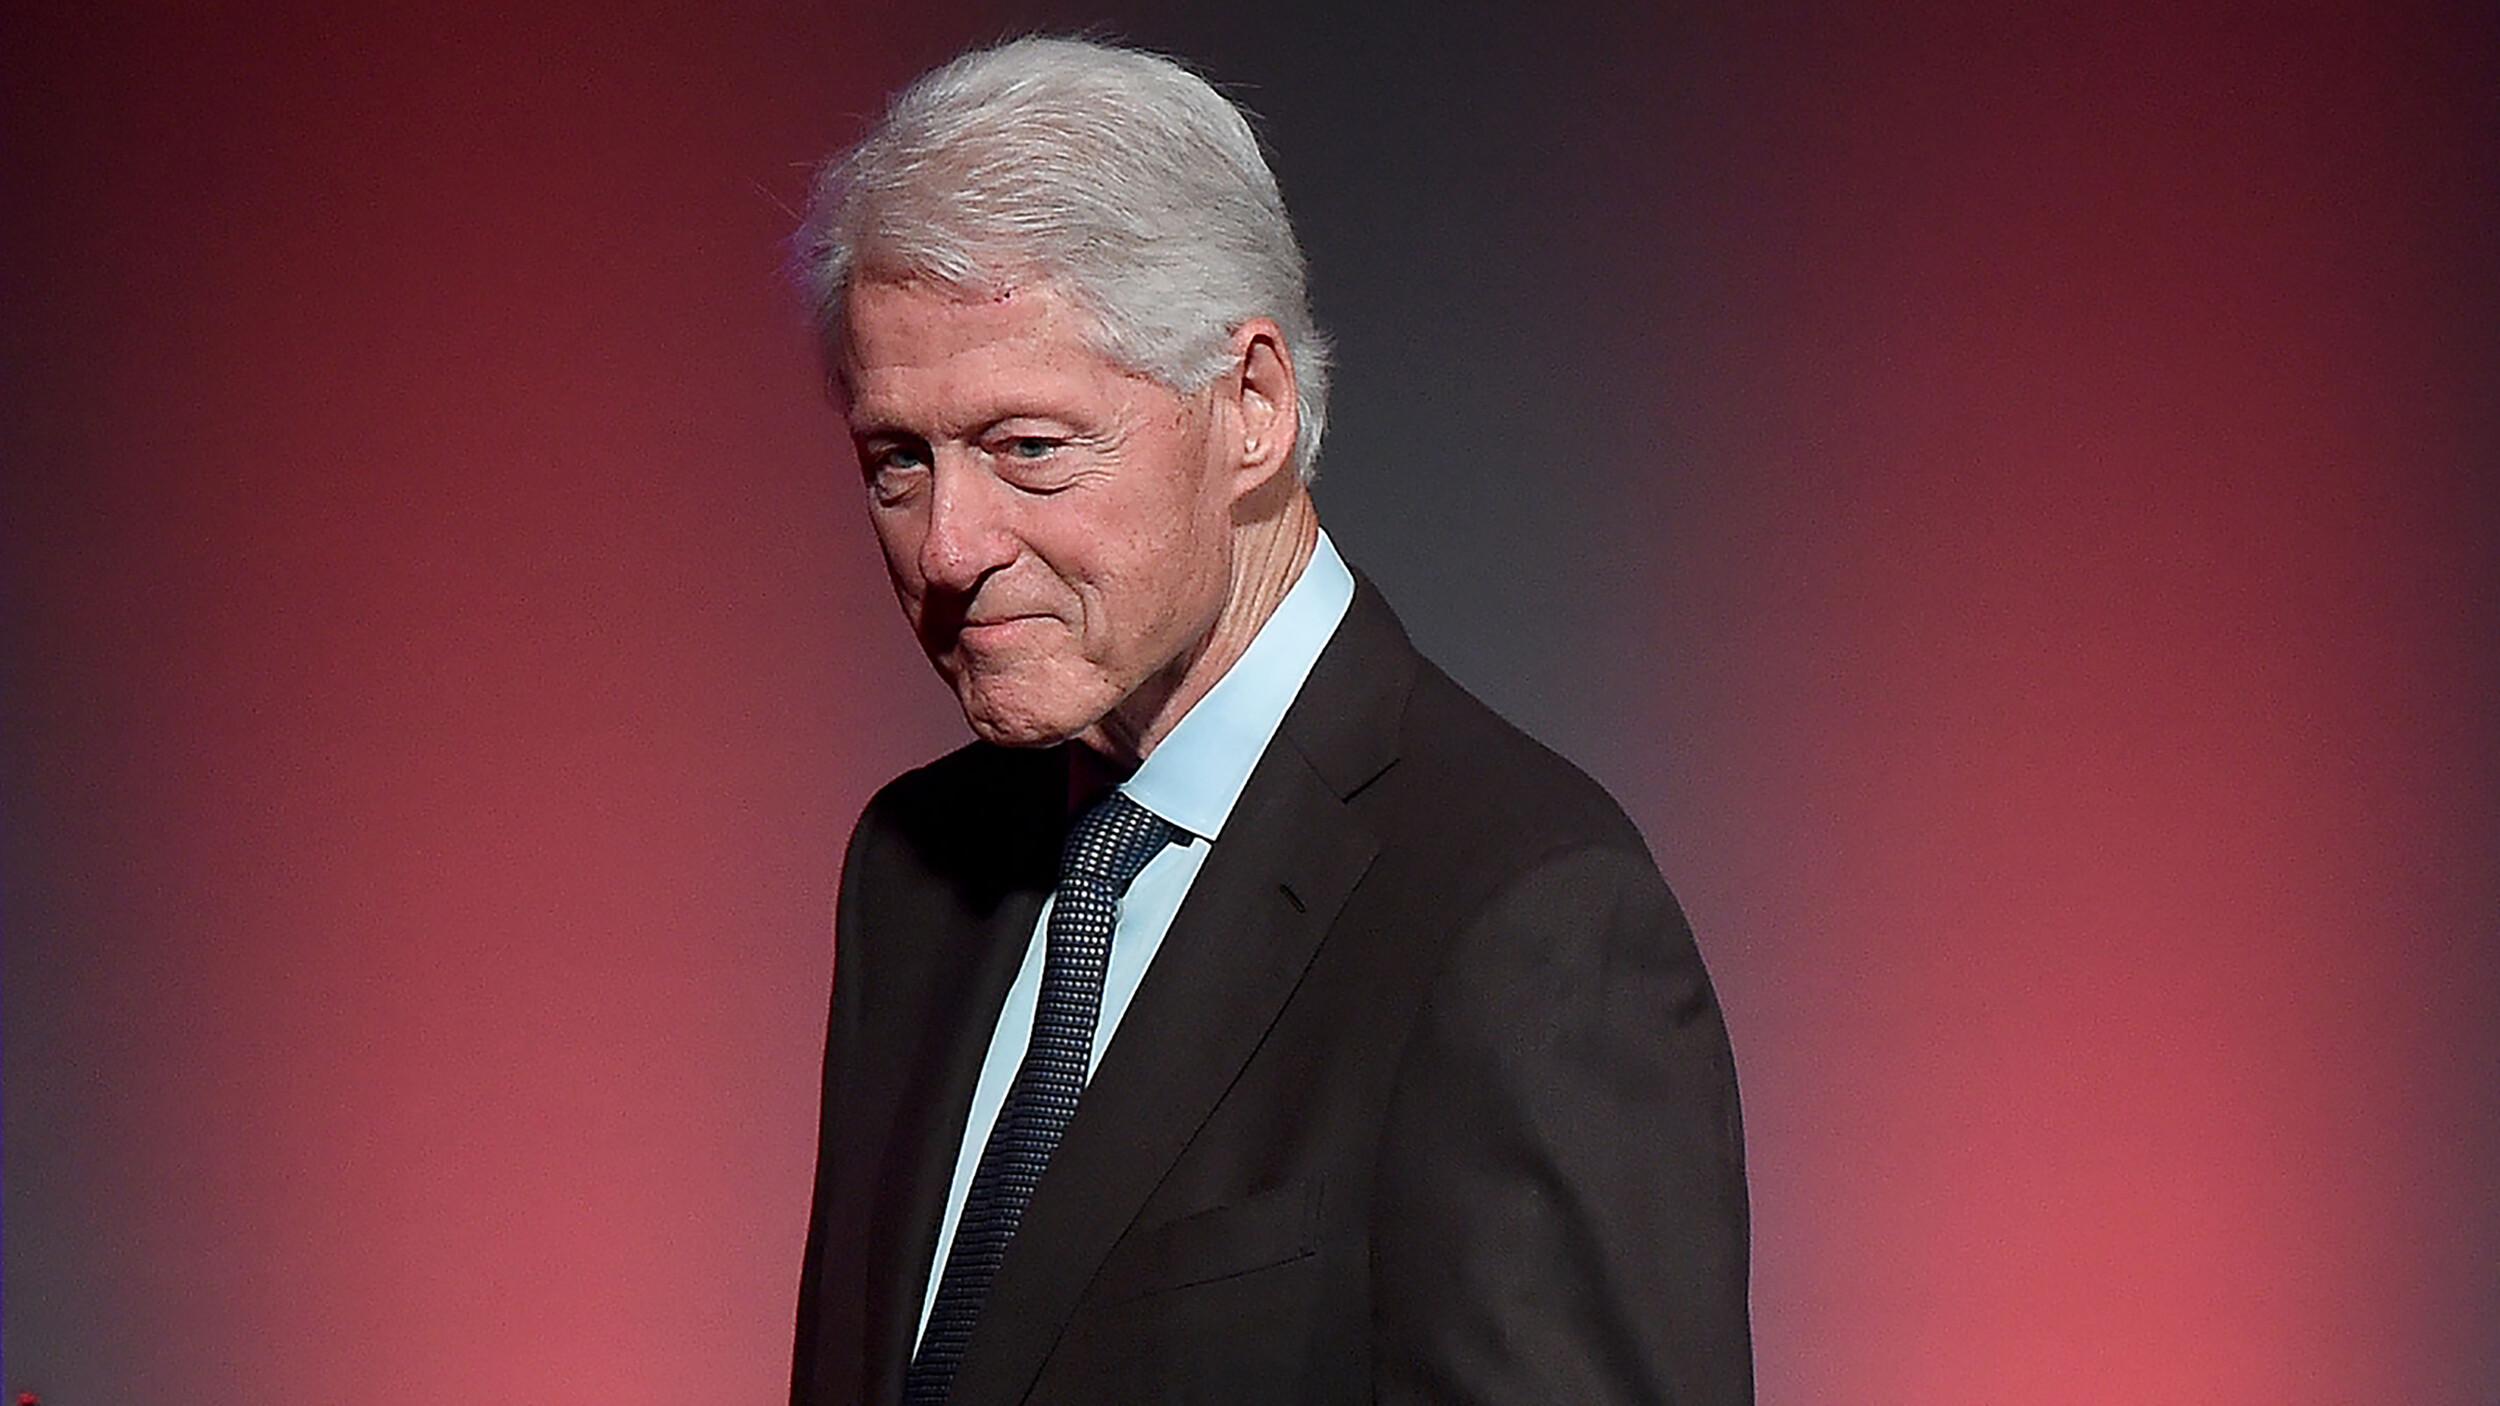 Biden speaks with Bill Clinton after former President's hospitalization